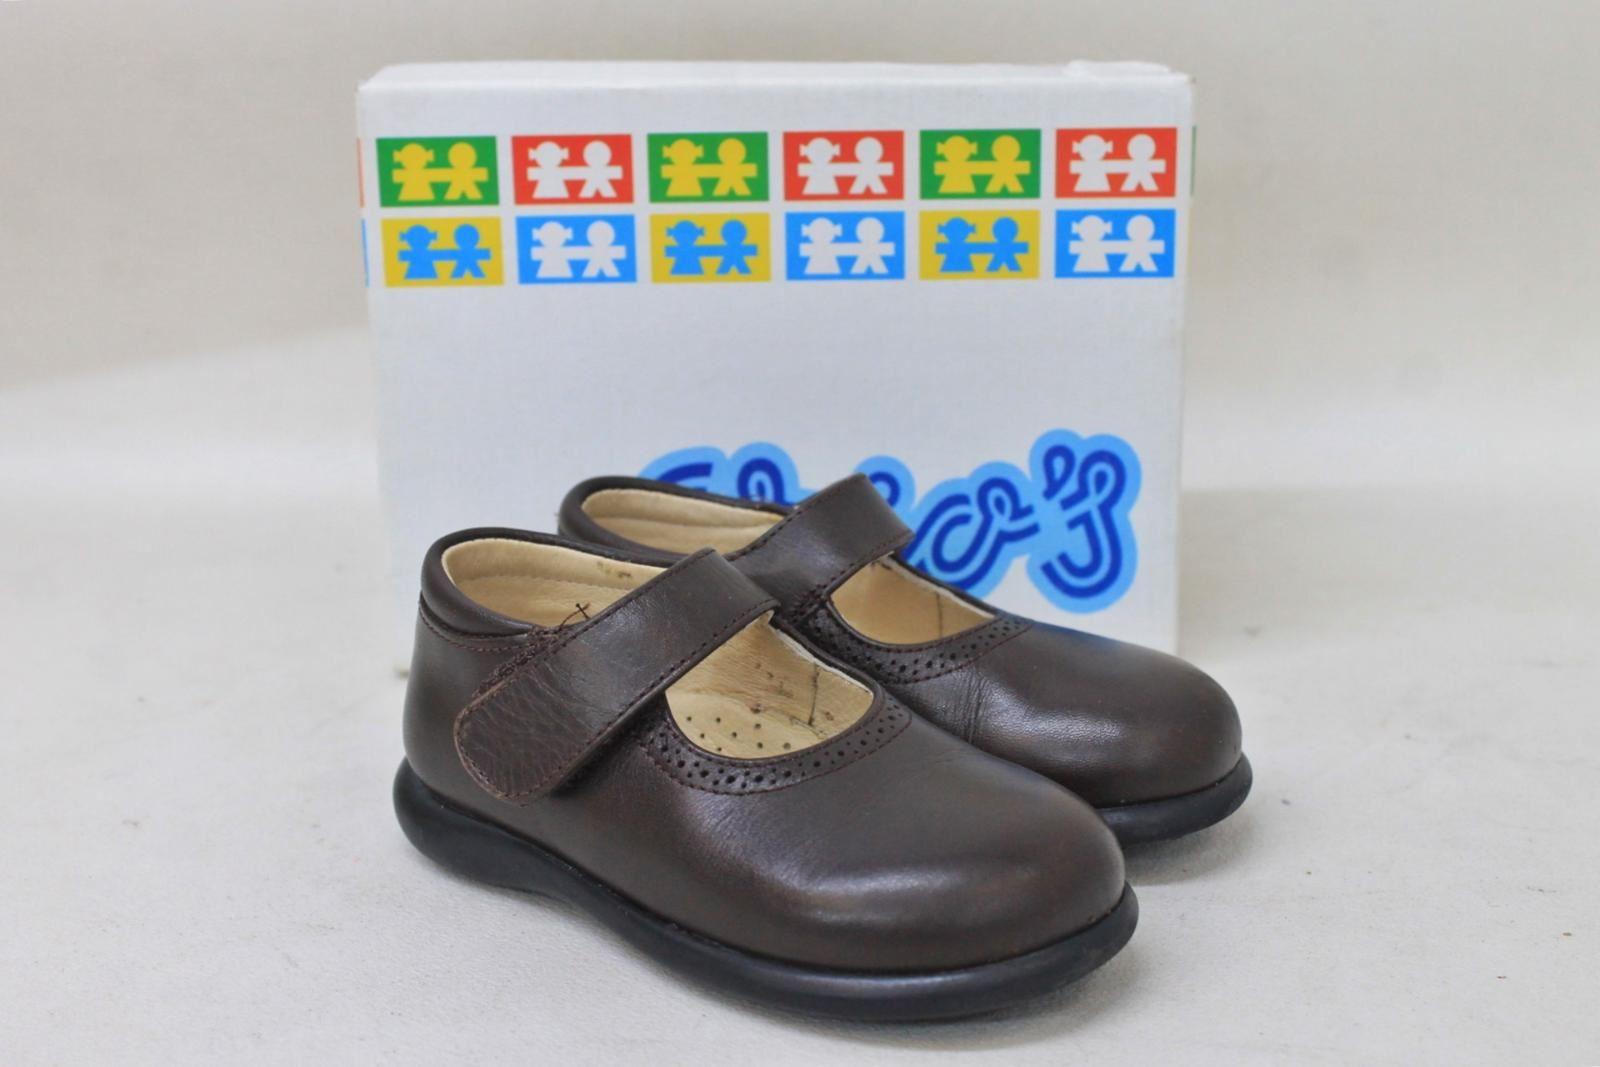 CRIO-Girls-Zapato-121-Chocolate-Leather-Mary-James-Flat-Shoes-Size-UK5-EU22